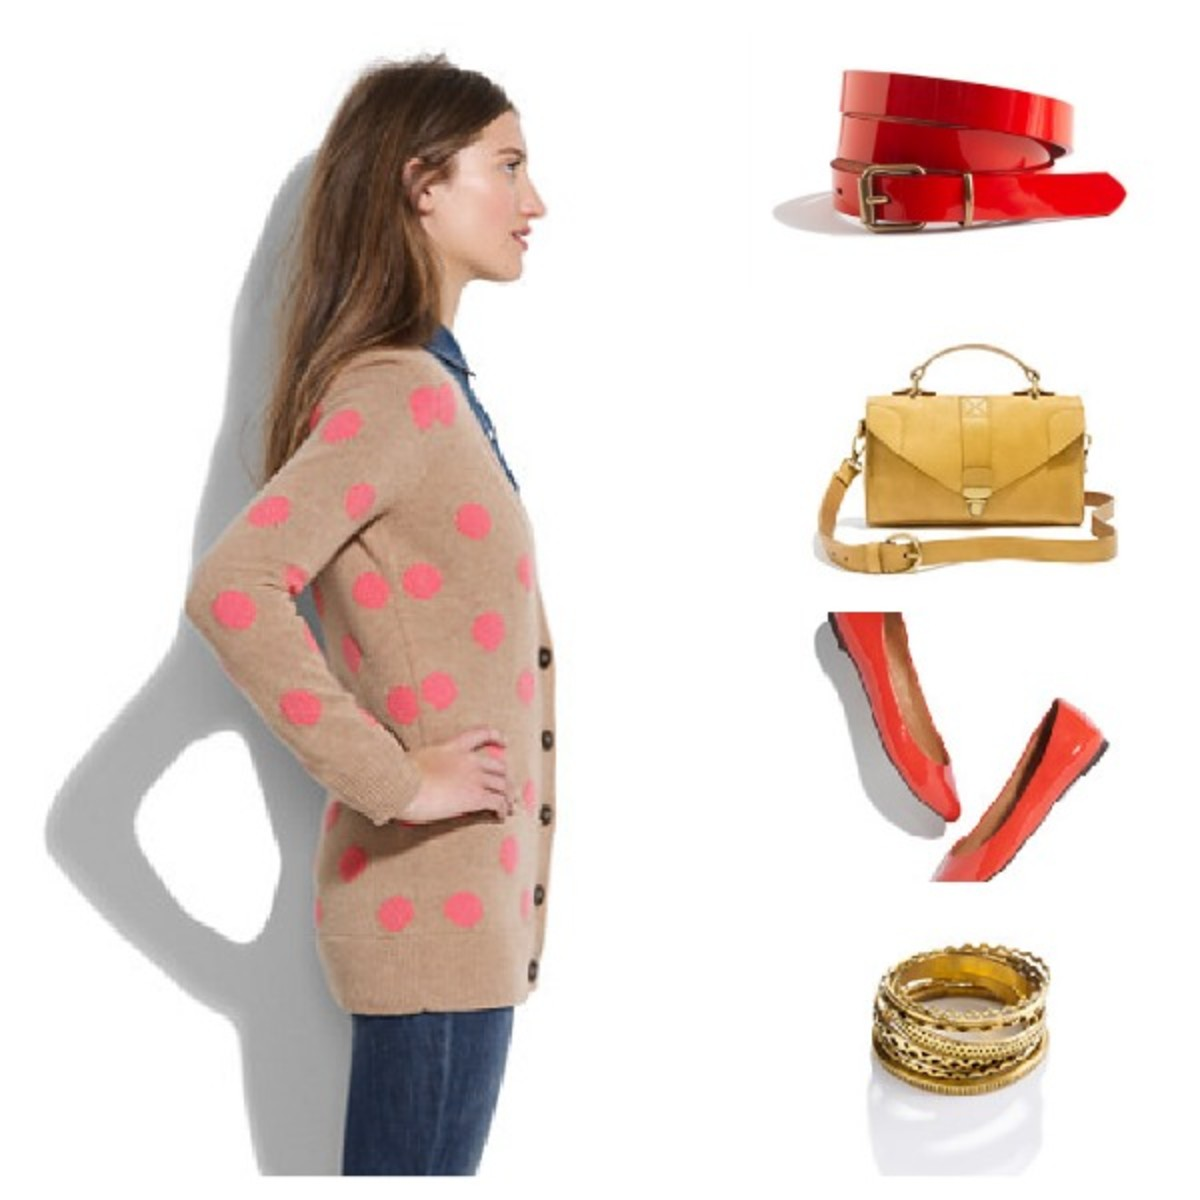 Modcloth fashions